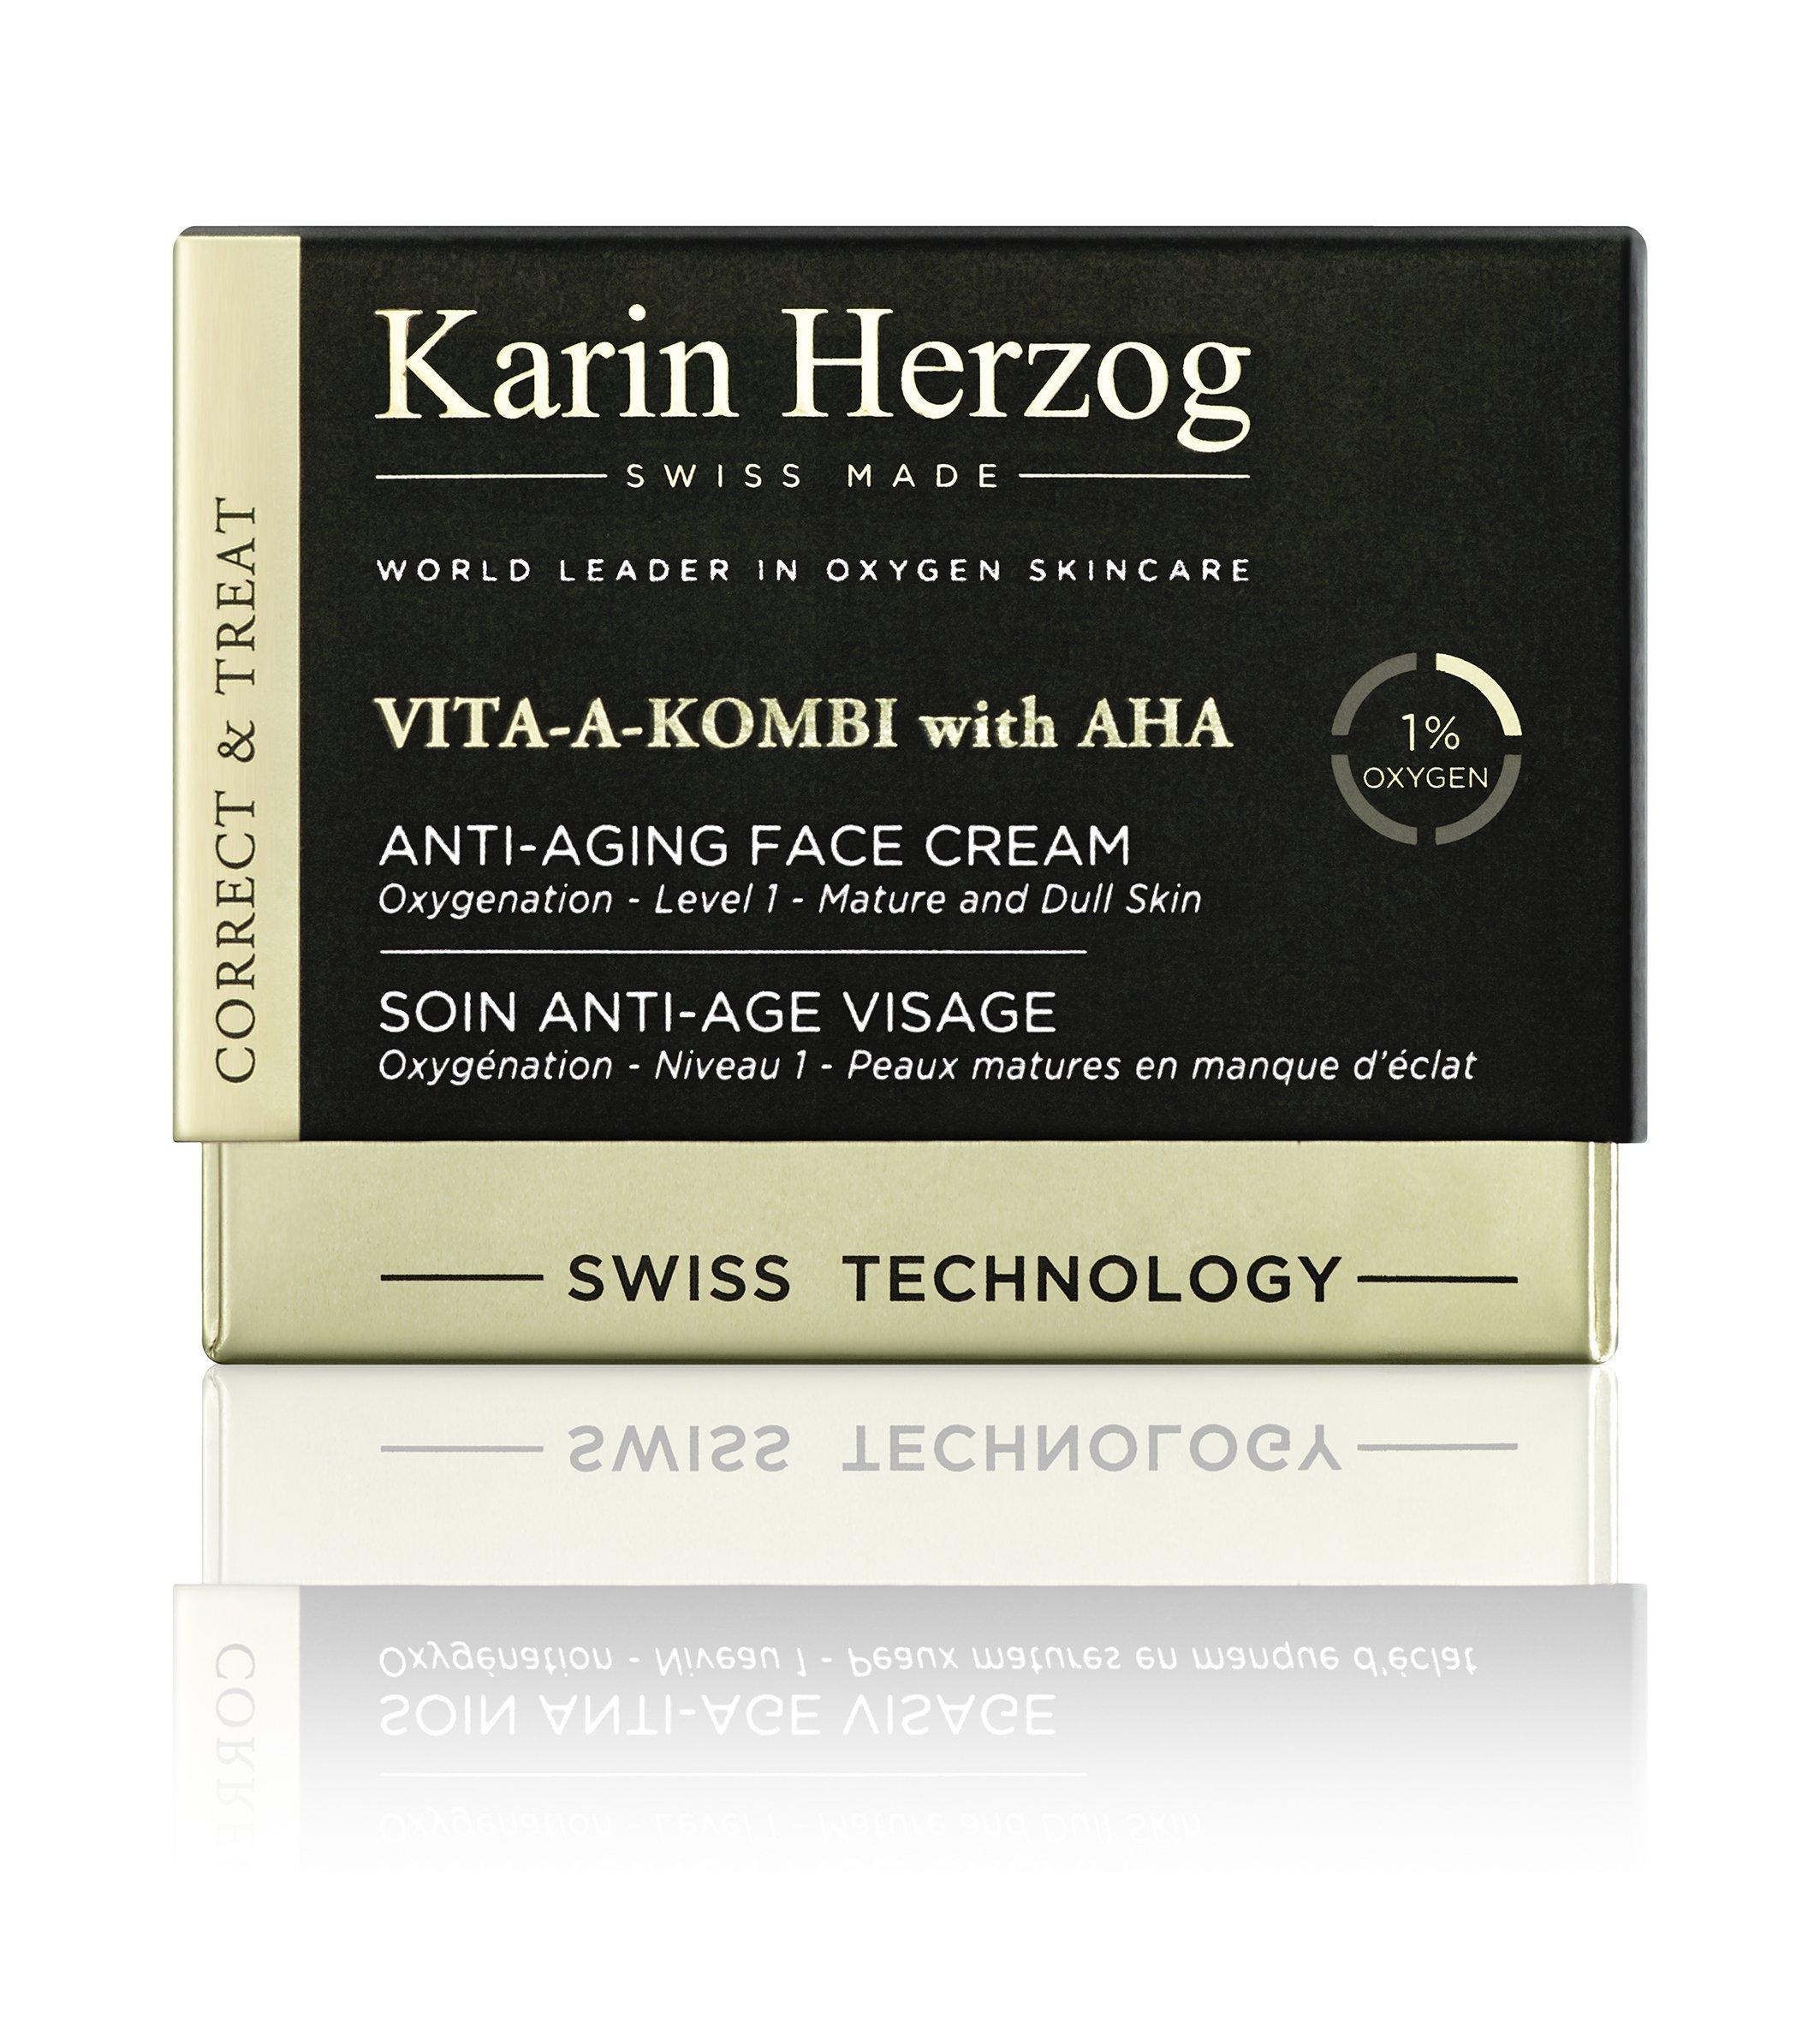 Karin Herzog Vita-A-Kombi with AHA (1.71 oz.)